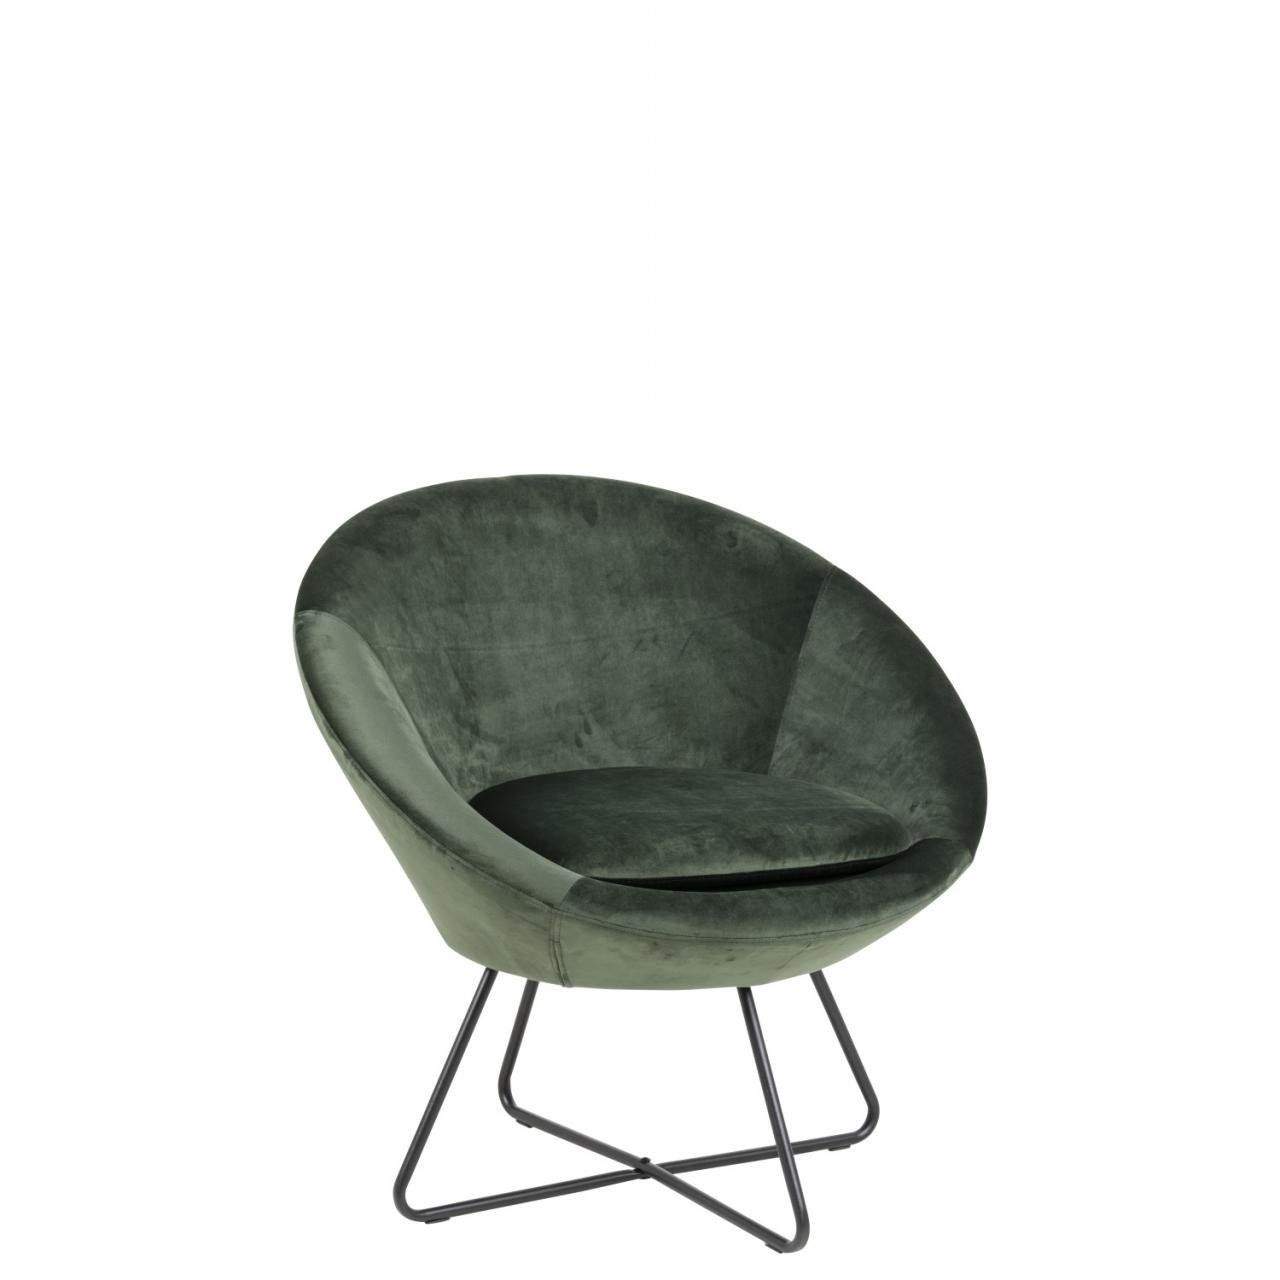 Loungestuhl Center 78549 Waldgrün Schwarz Stoff Metall Retro Sessel Stuhl